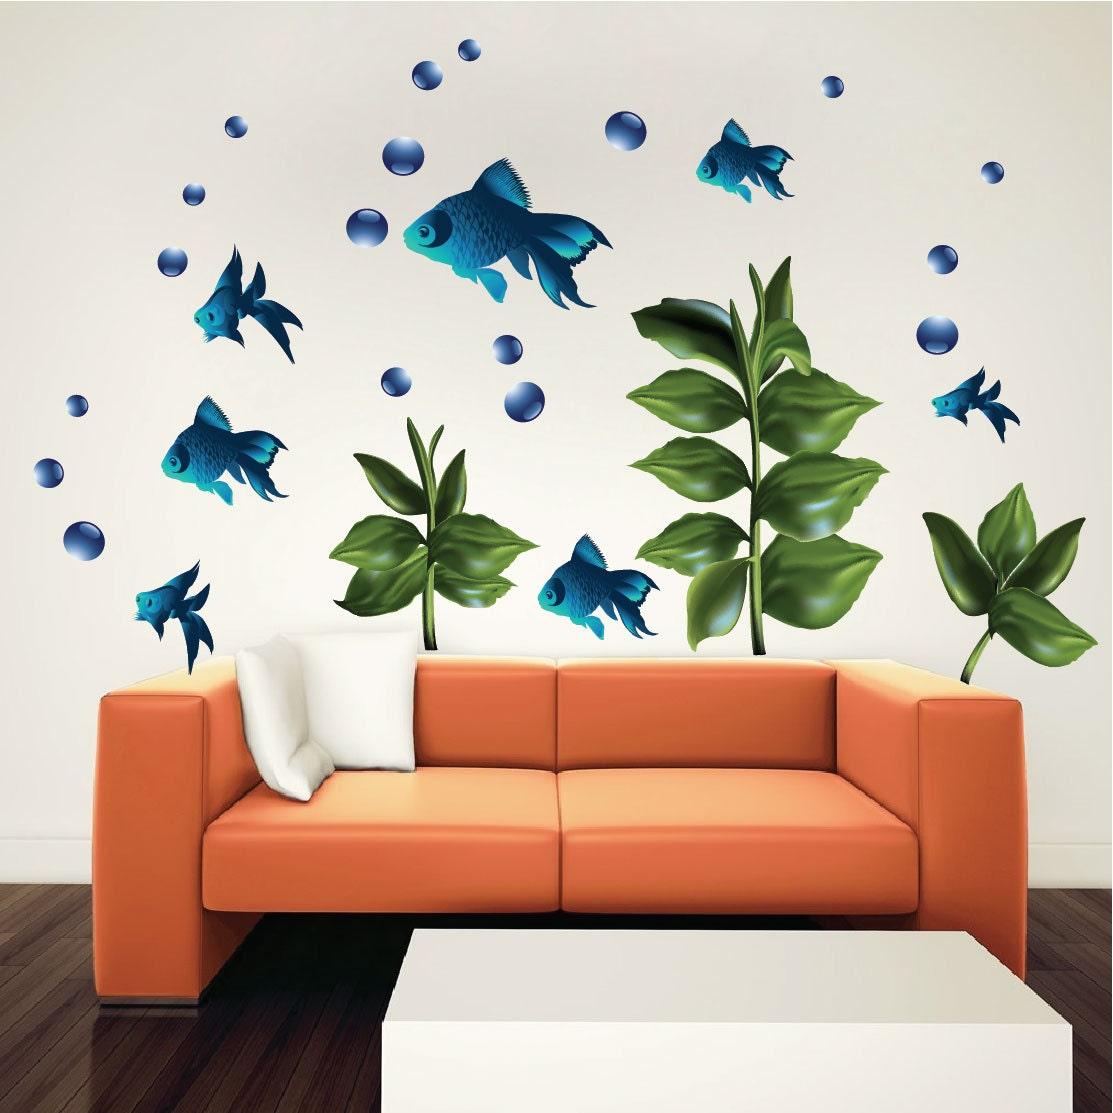 Kids bedroom fish decor decals fish wall murals bedroom sea for Fish decor for walls